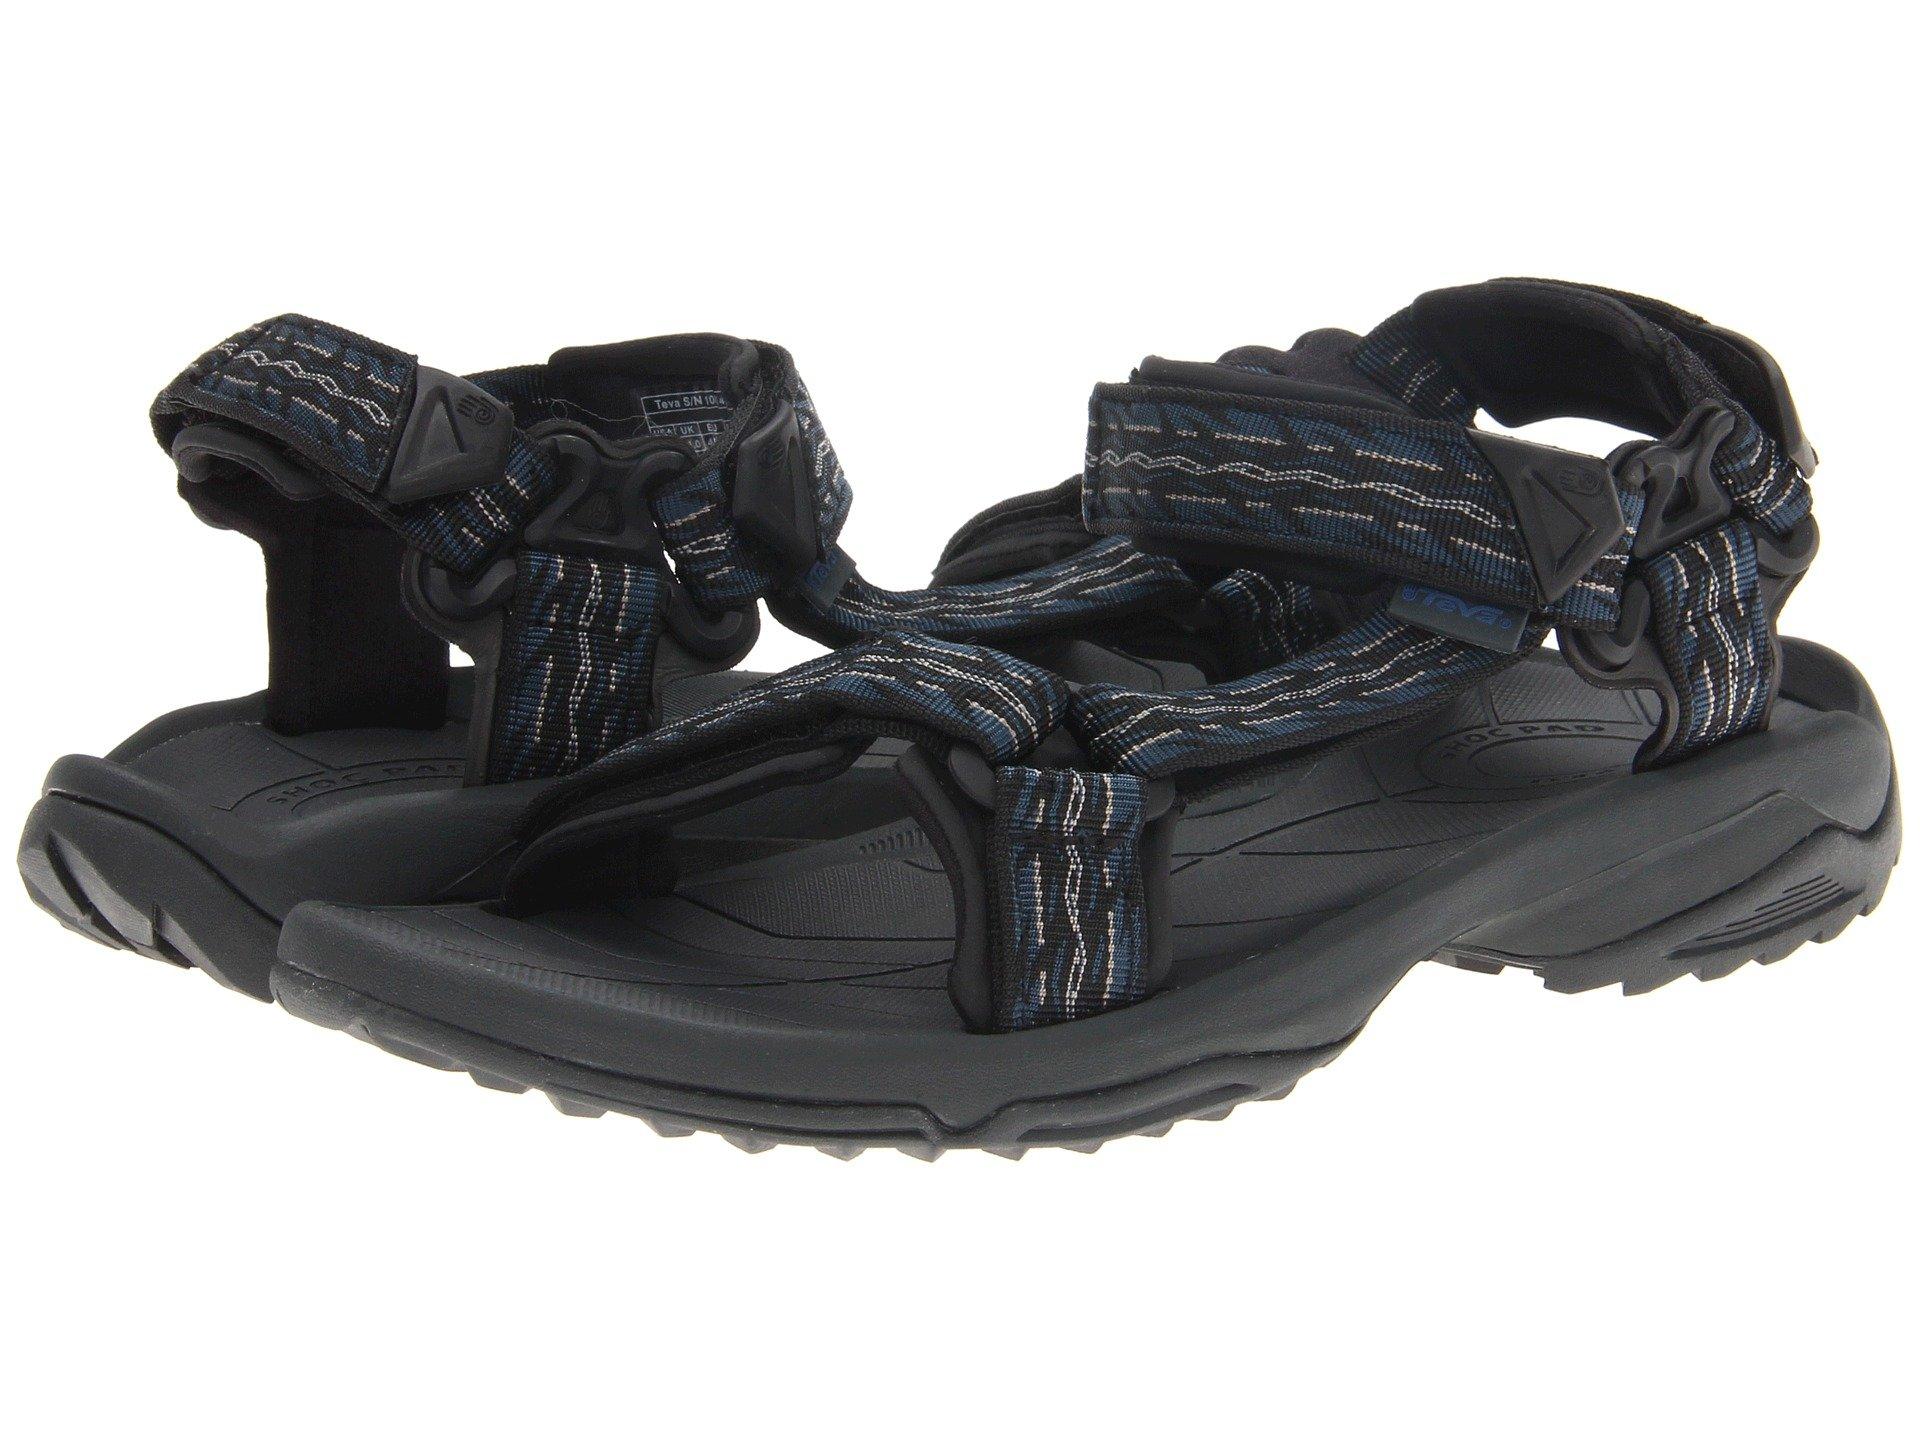 TEVA Men'S M Terra Fi 4 Water-Resistant Sandals Men'S Shoes in Firetread Midnight